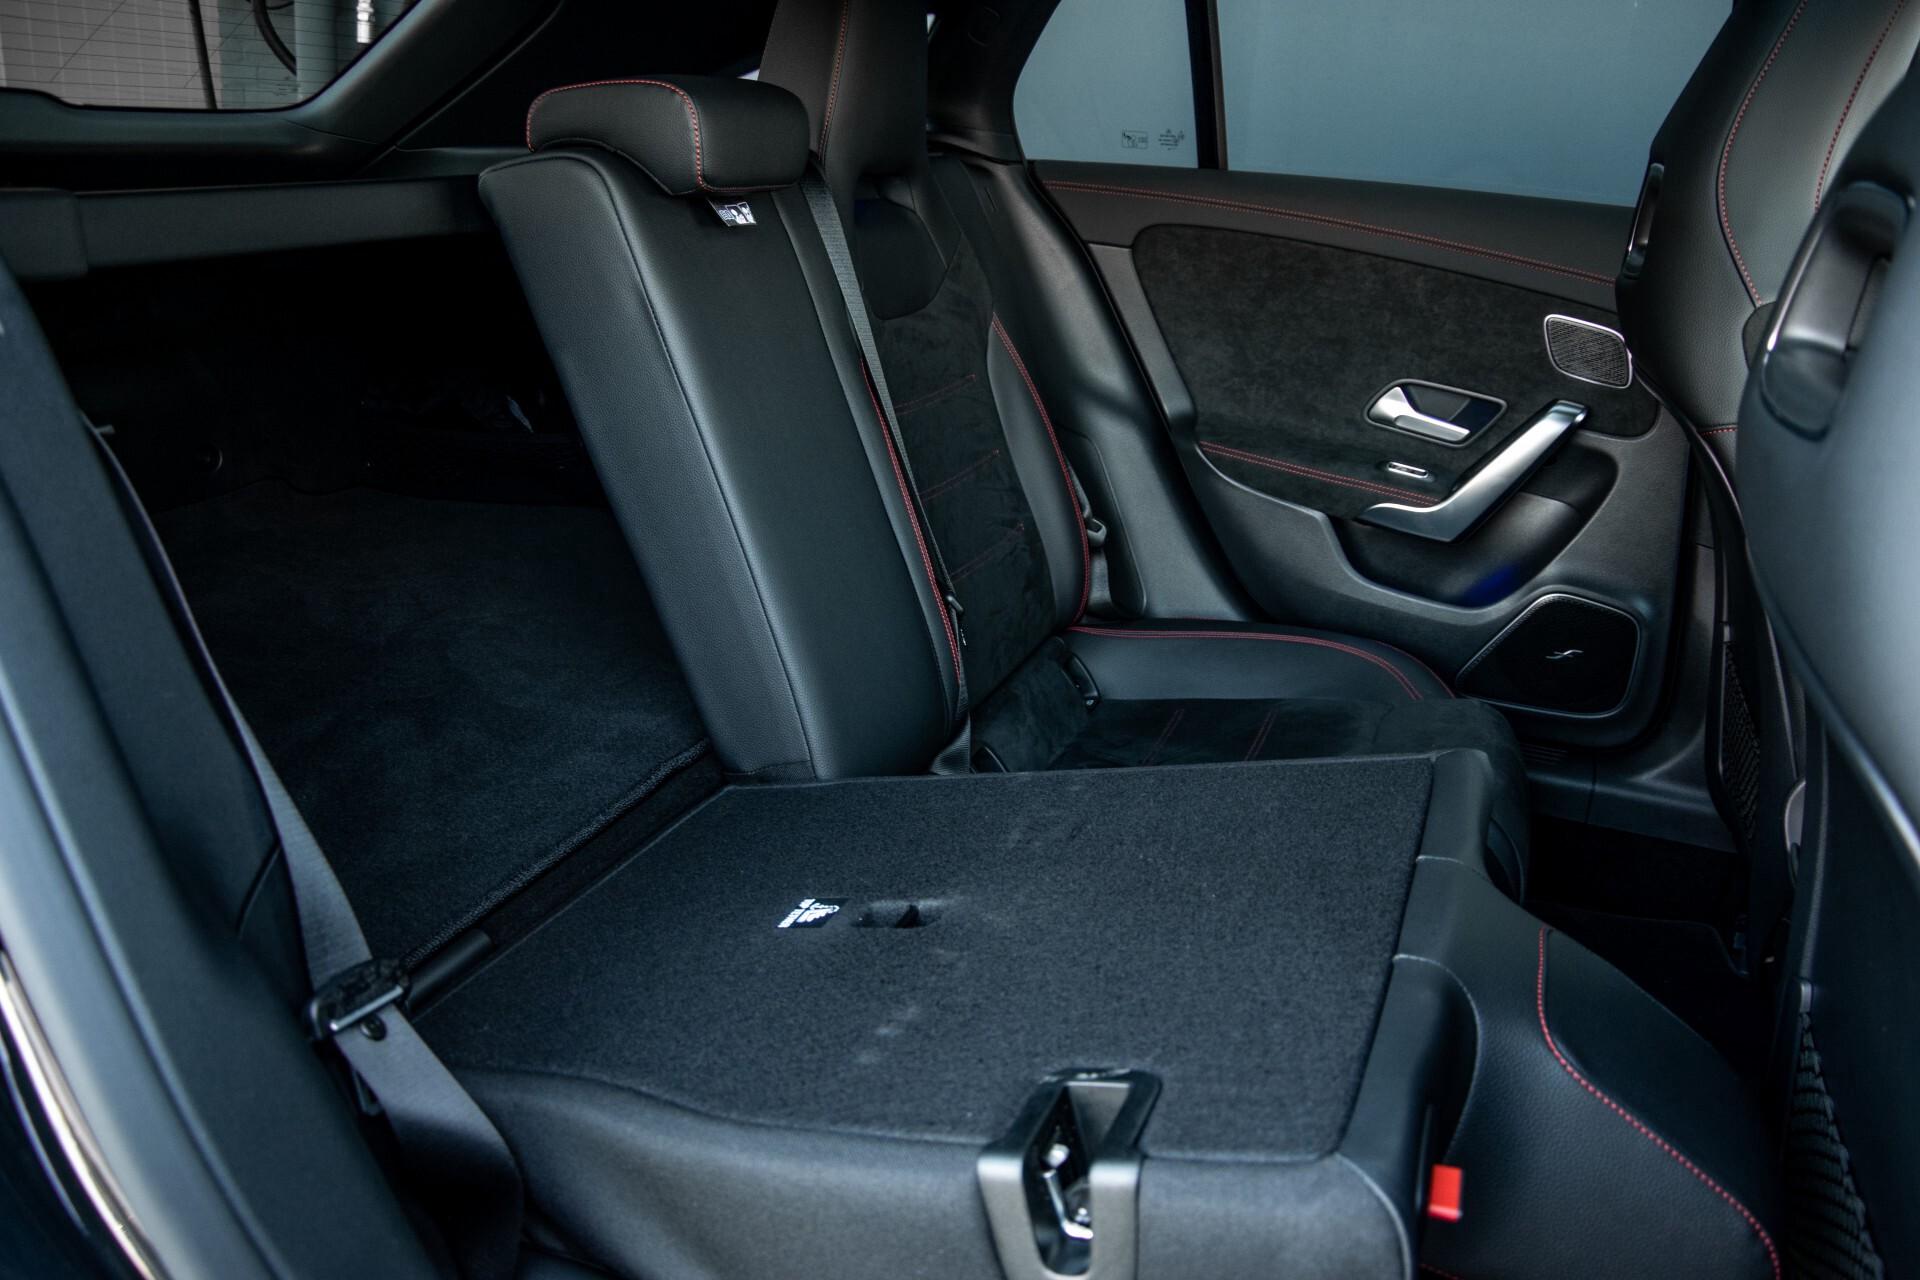 Mercedes-Benz CLA-Klasse Shooting Brake 250 AMG Panorama/Rij-assistentie/Burmester/Night Aut7 Foto 5